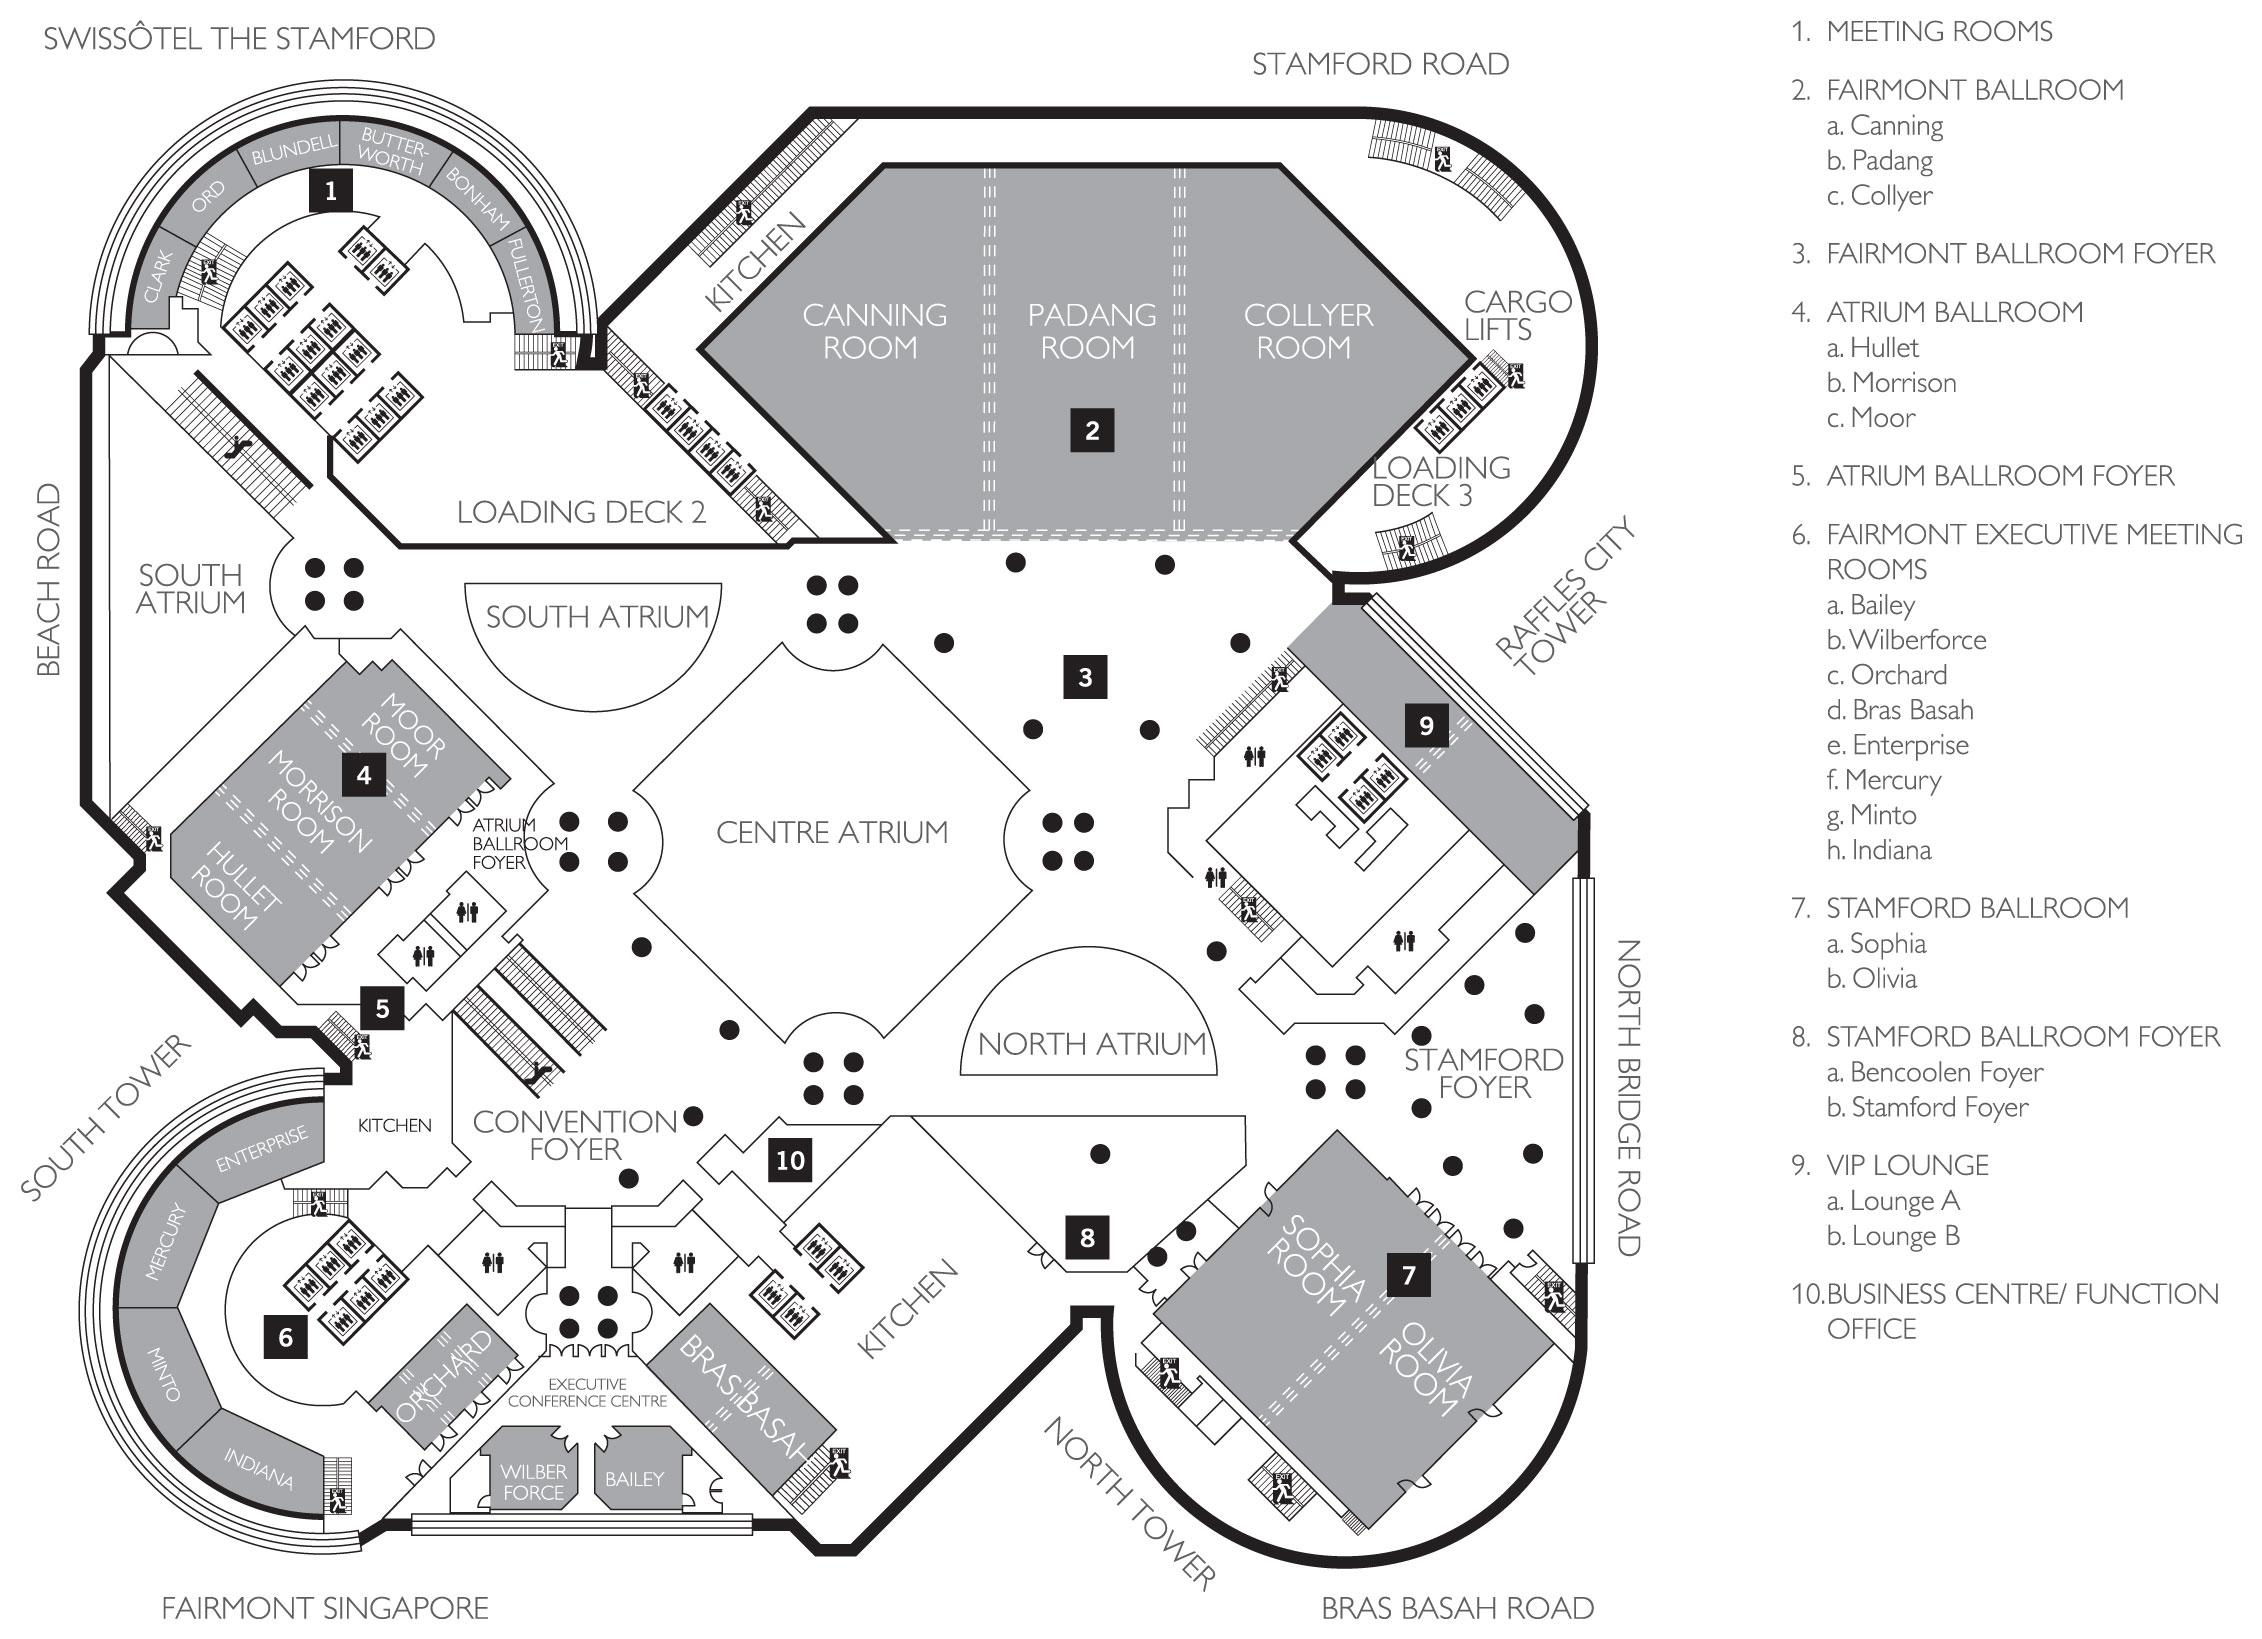 Atrium Ballroom Swissotel The Stamford Swiss 244 Tel